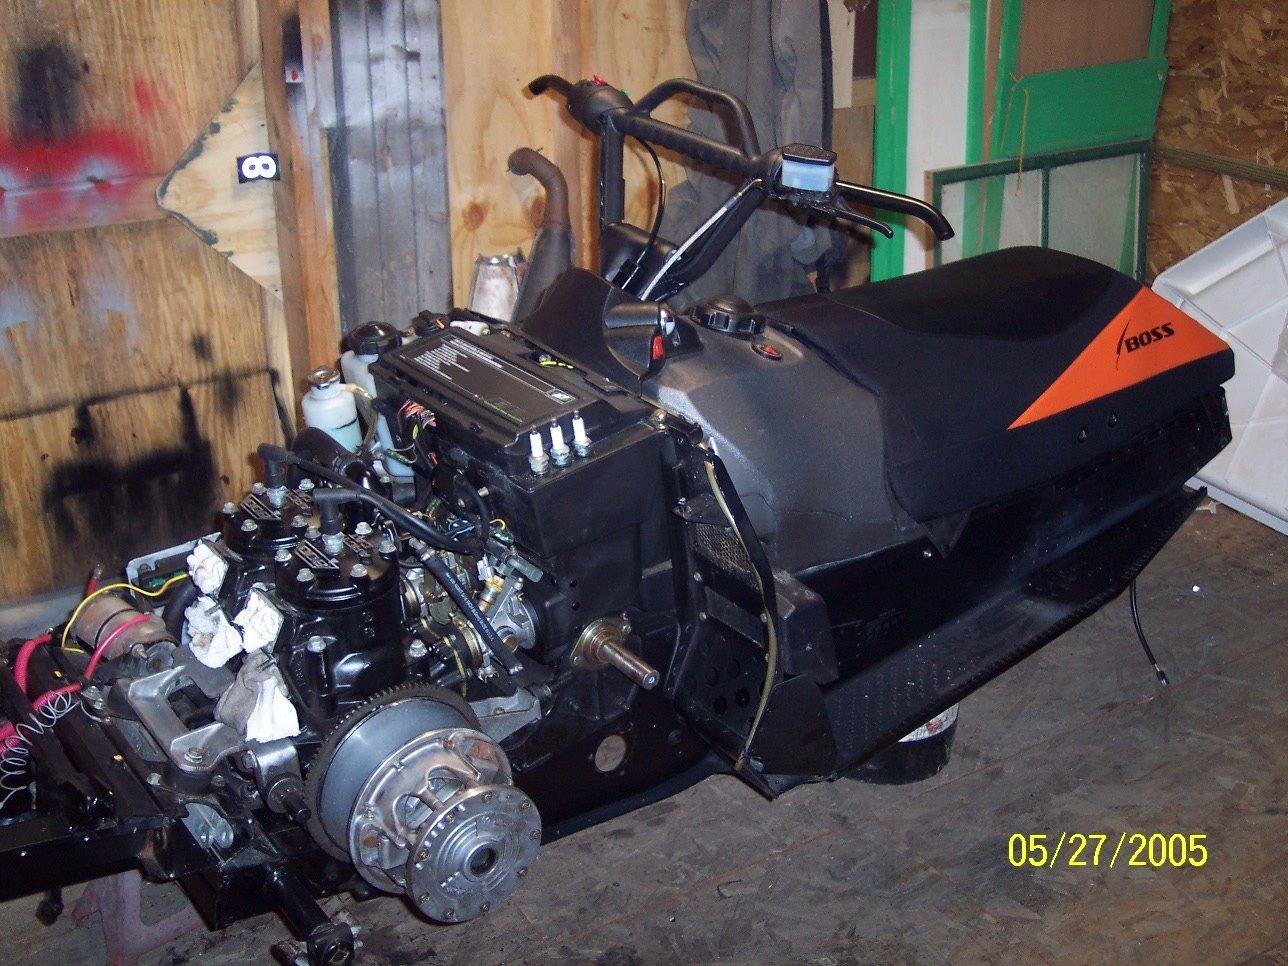 Engine Torque Bumper-sled05.jpg